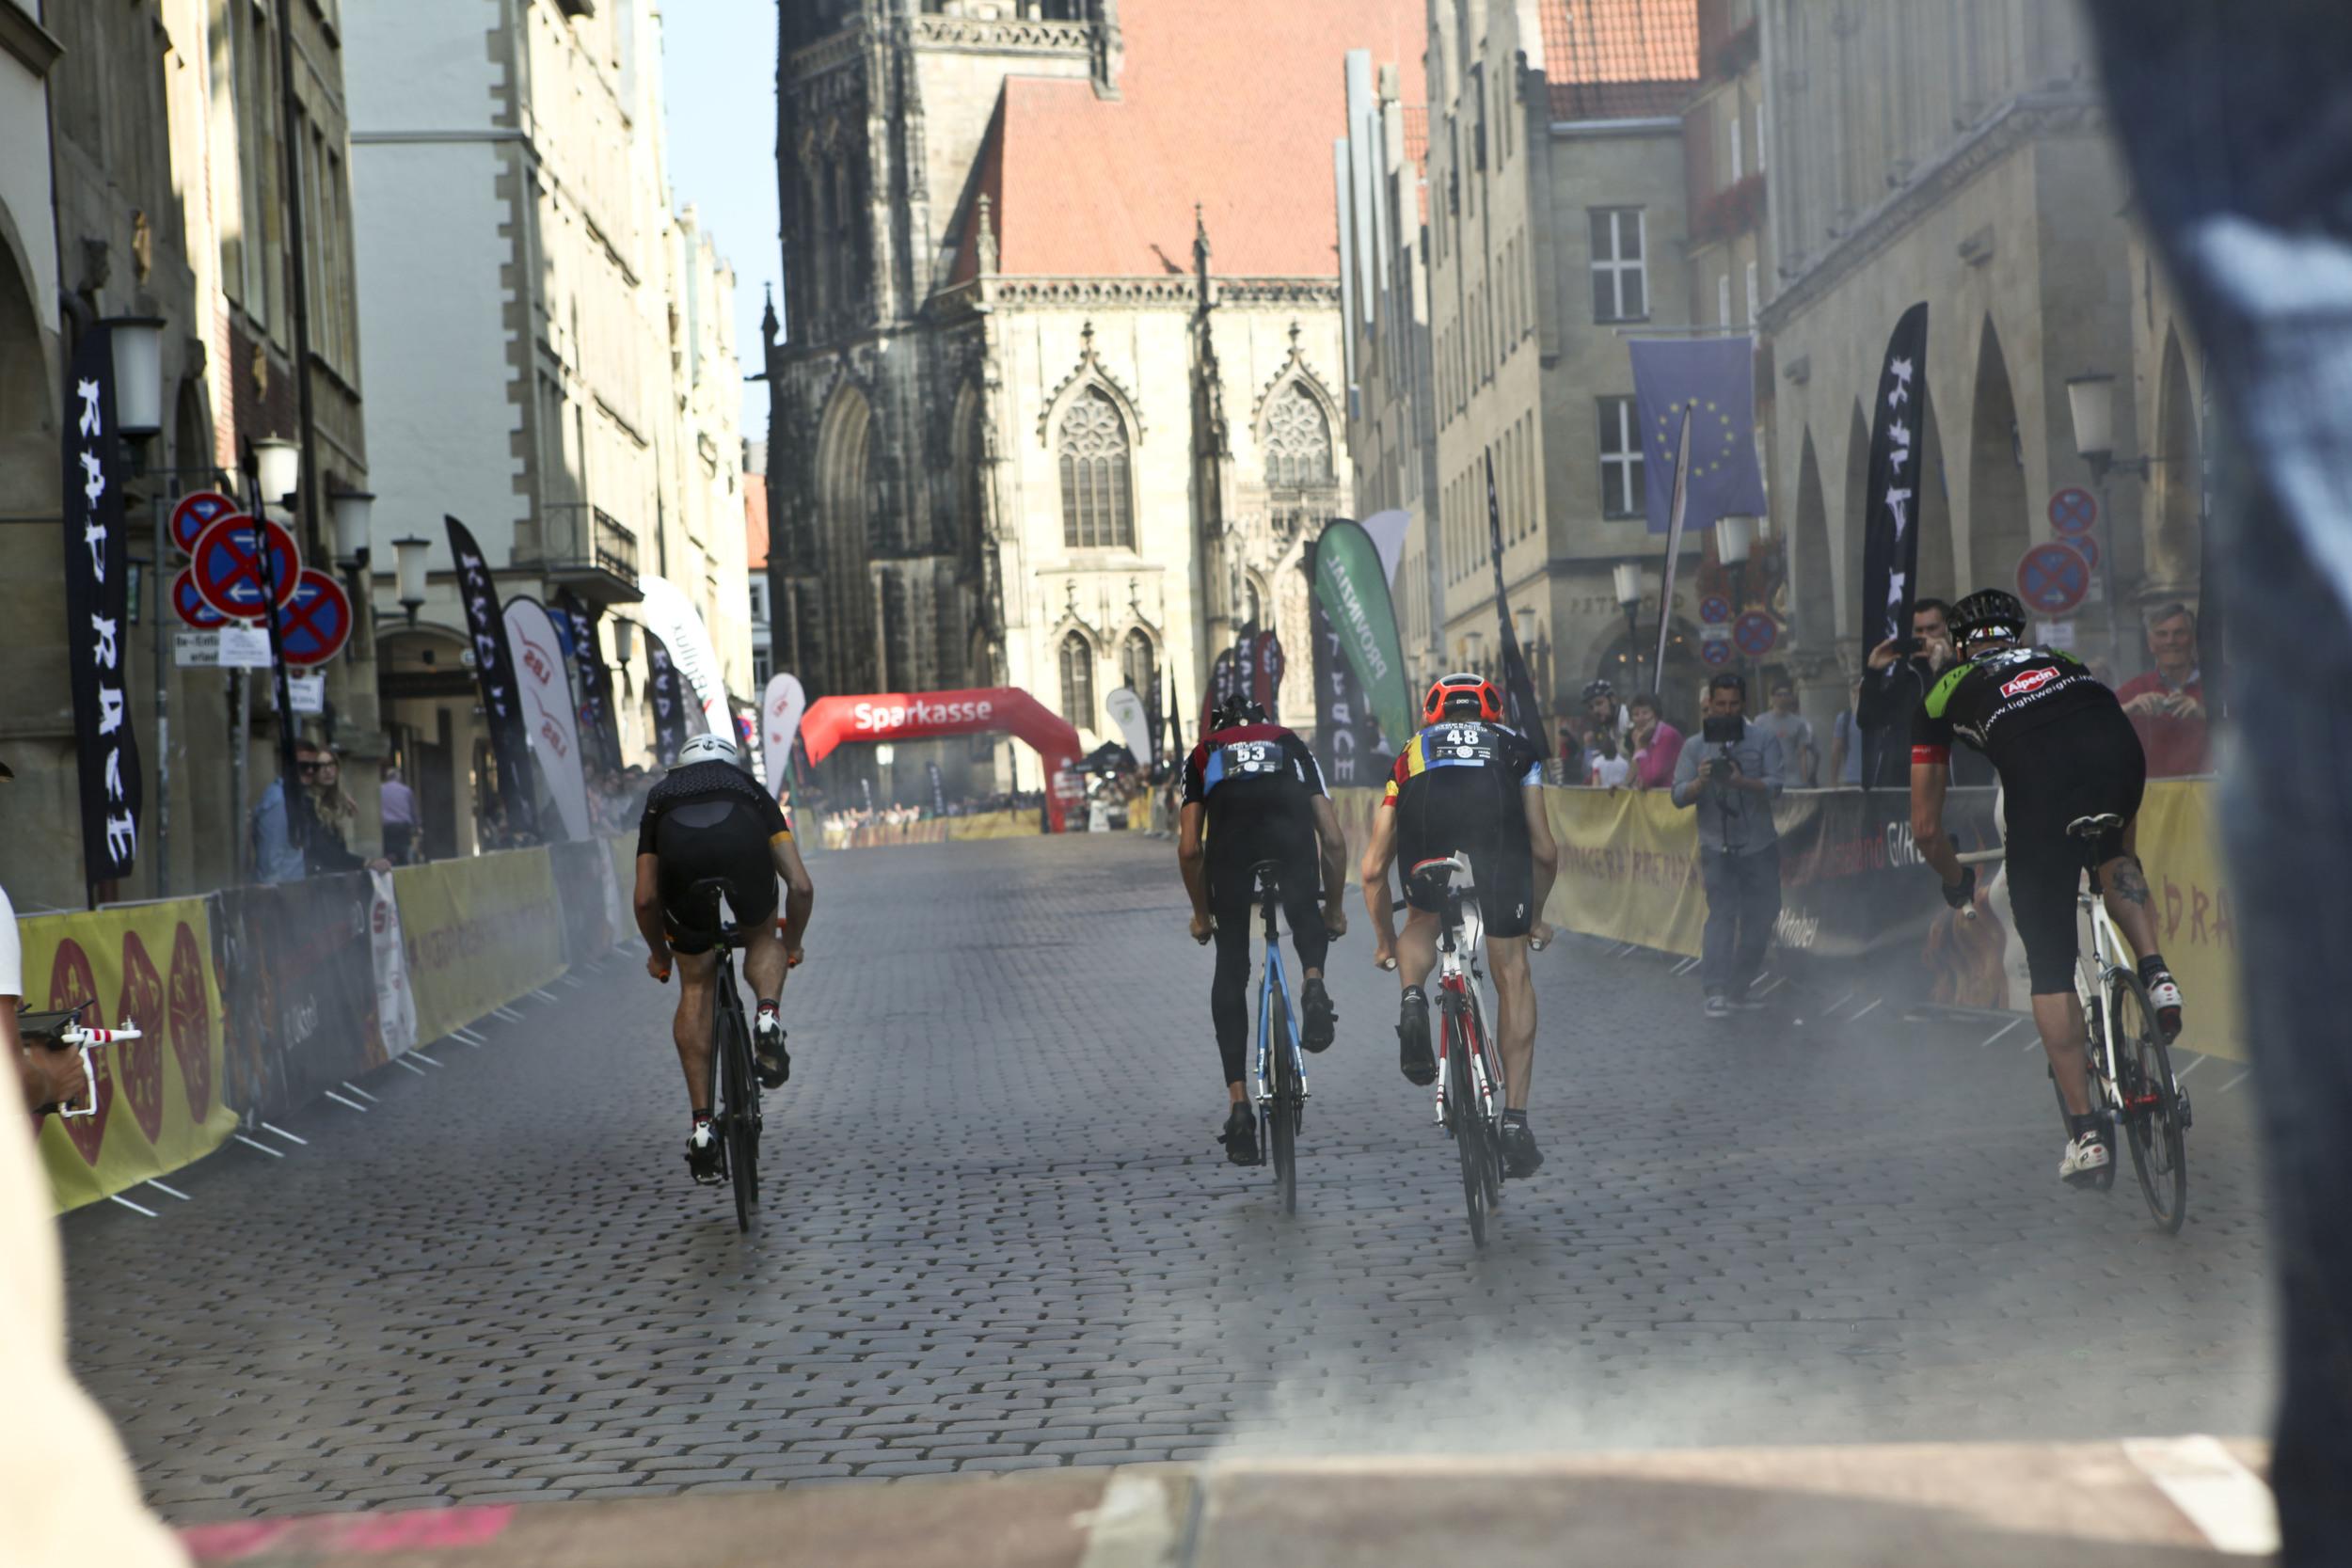 RAD RACE BATTLE Münster 2014 Pic by Erol Taskoparan_3.jpg